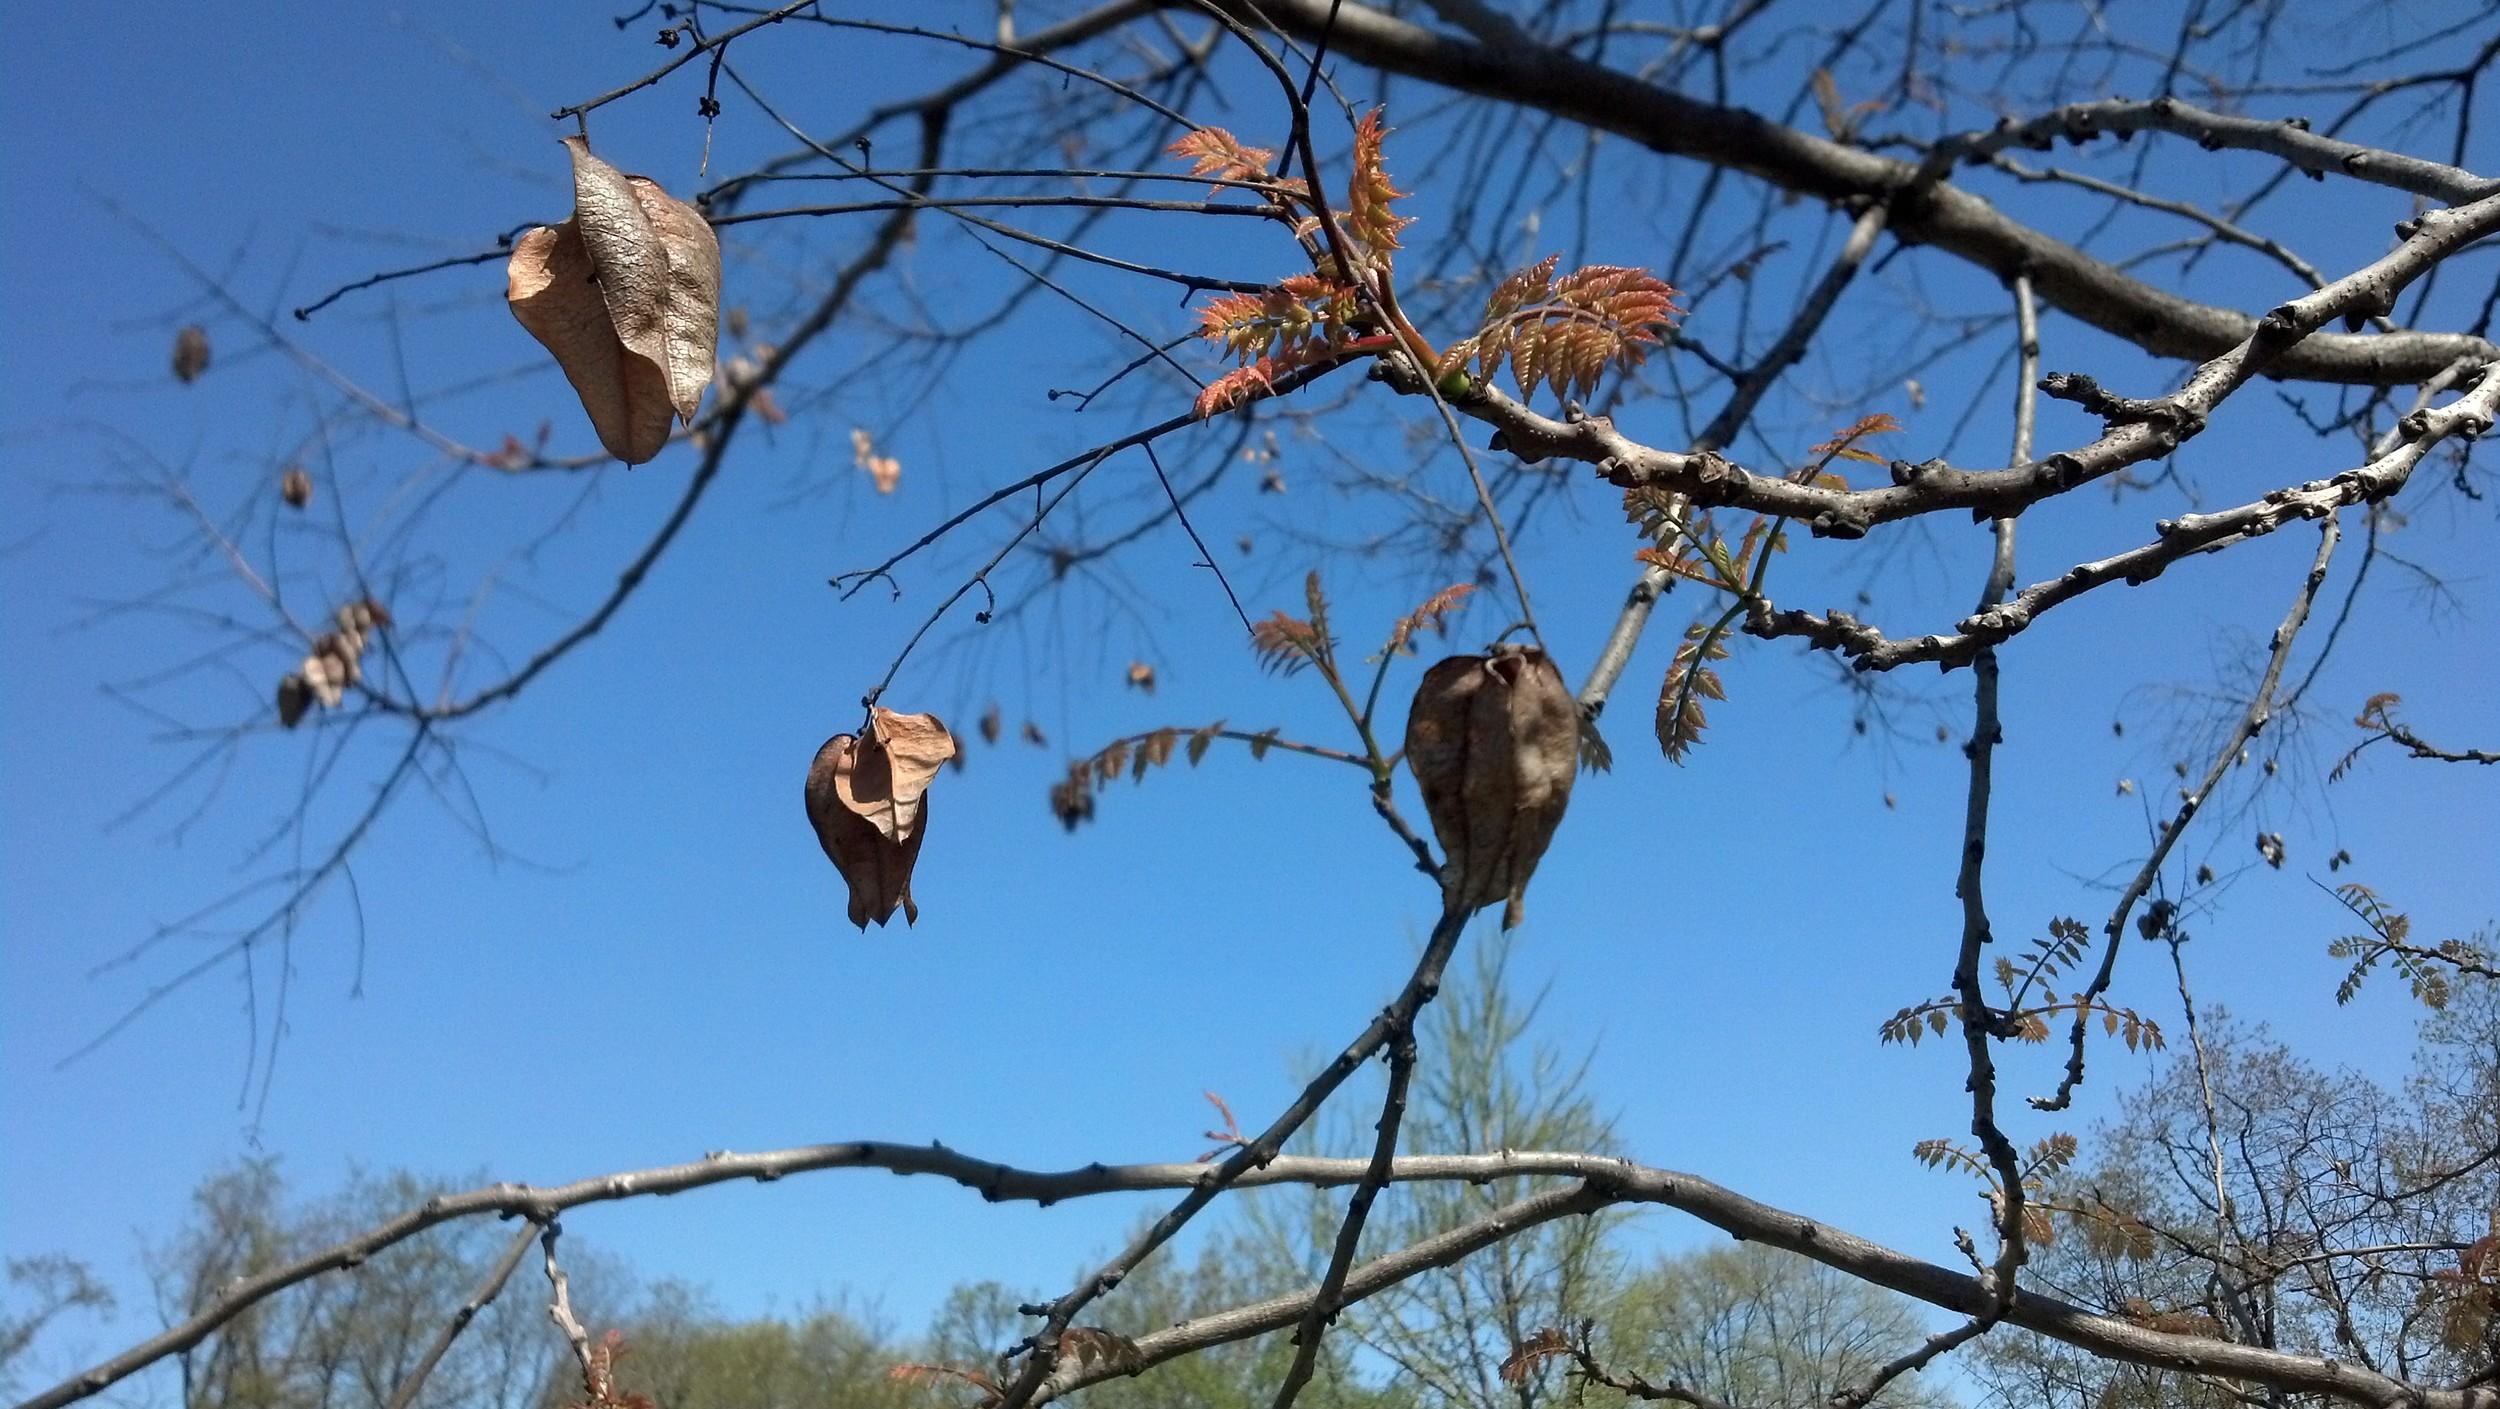 Koelreuteria paniculata  Sapindaceae Goldenrain tree - last season's fruit